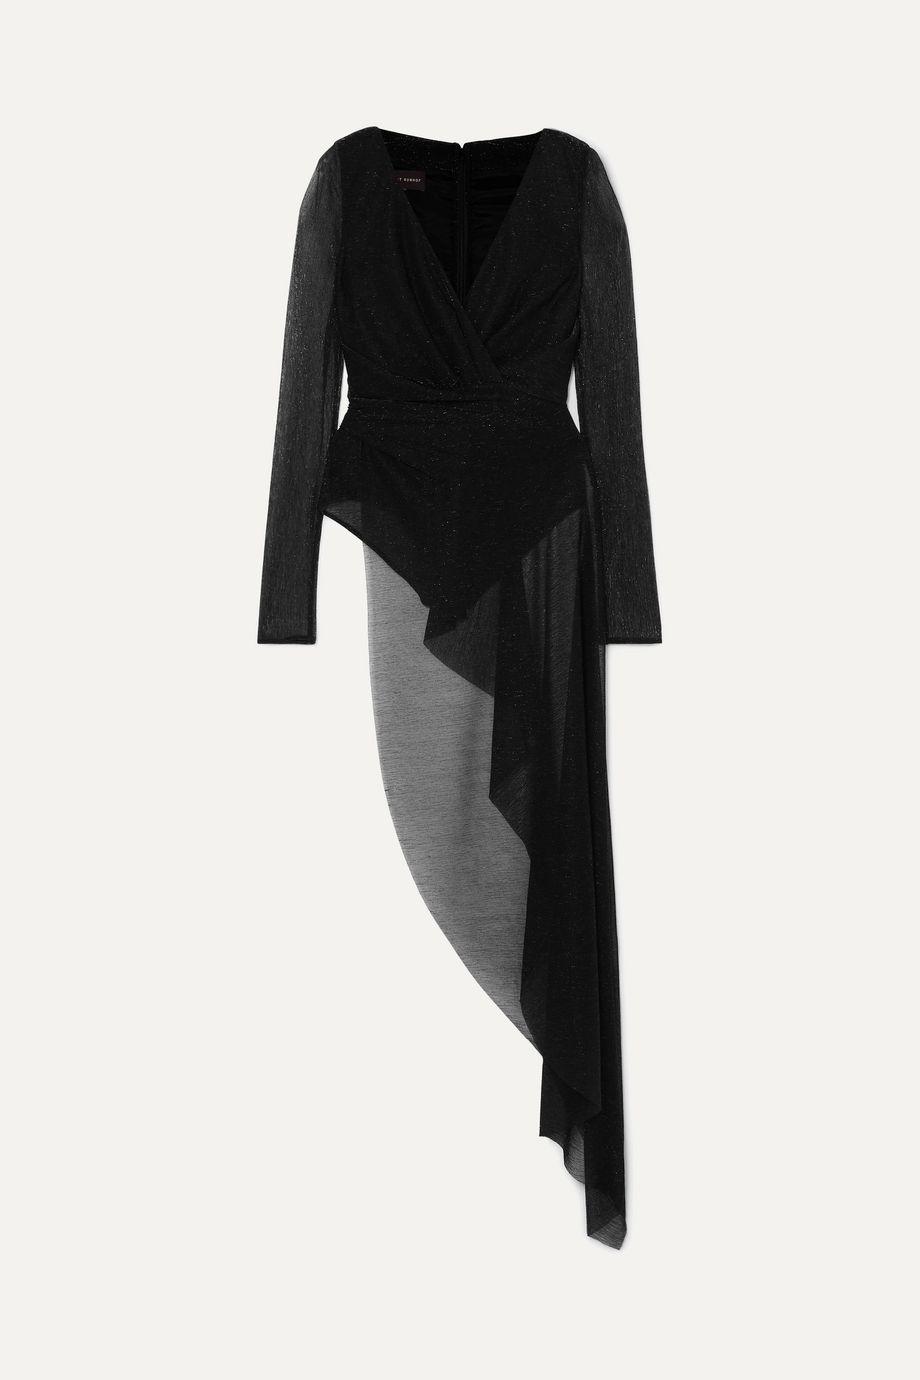 Talbot Runhof Babylone asymmetric draped metallic voile bodysuit